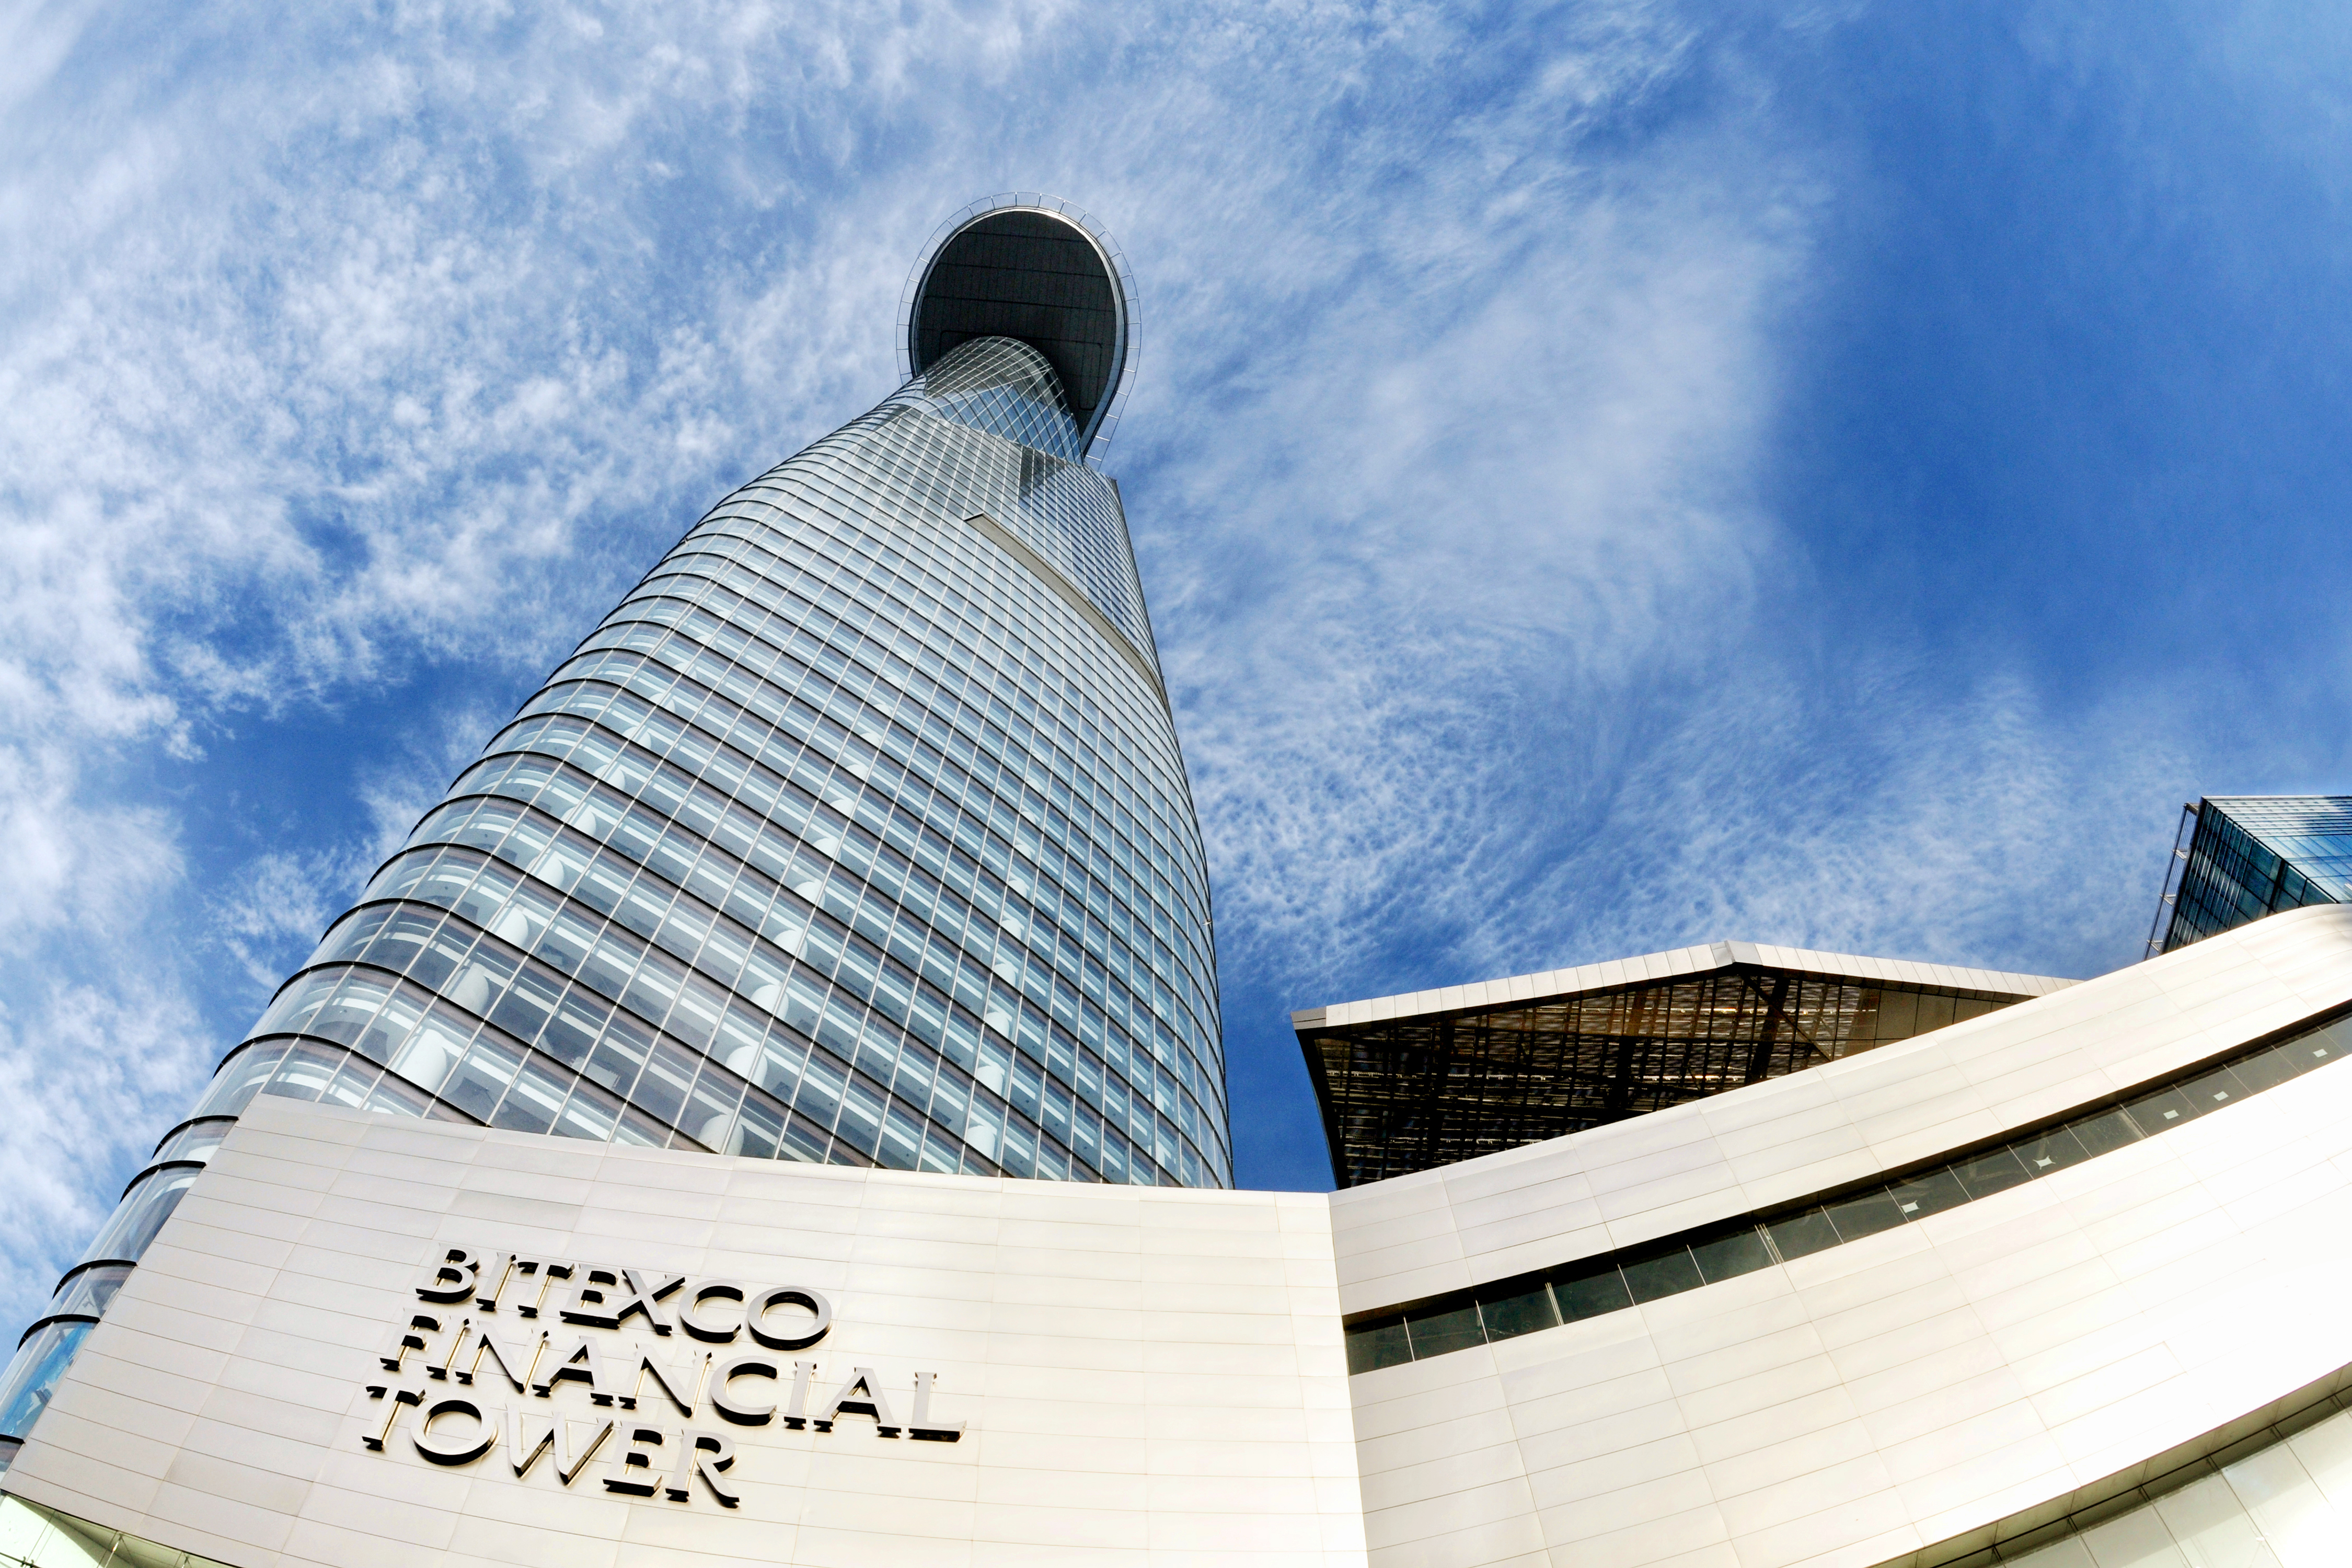 bitexco financial tower Property name: bitexco financial tower property type: retail & office for lease  location: 2 hai trieu, district 1, hcmc rental: please call + 84 936 299 899.